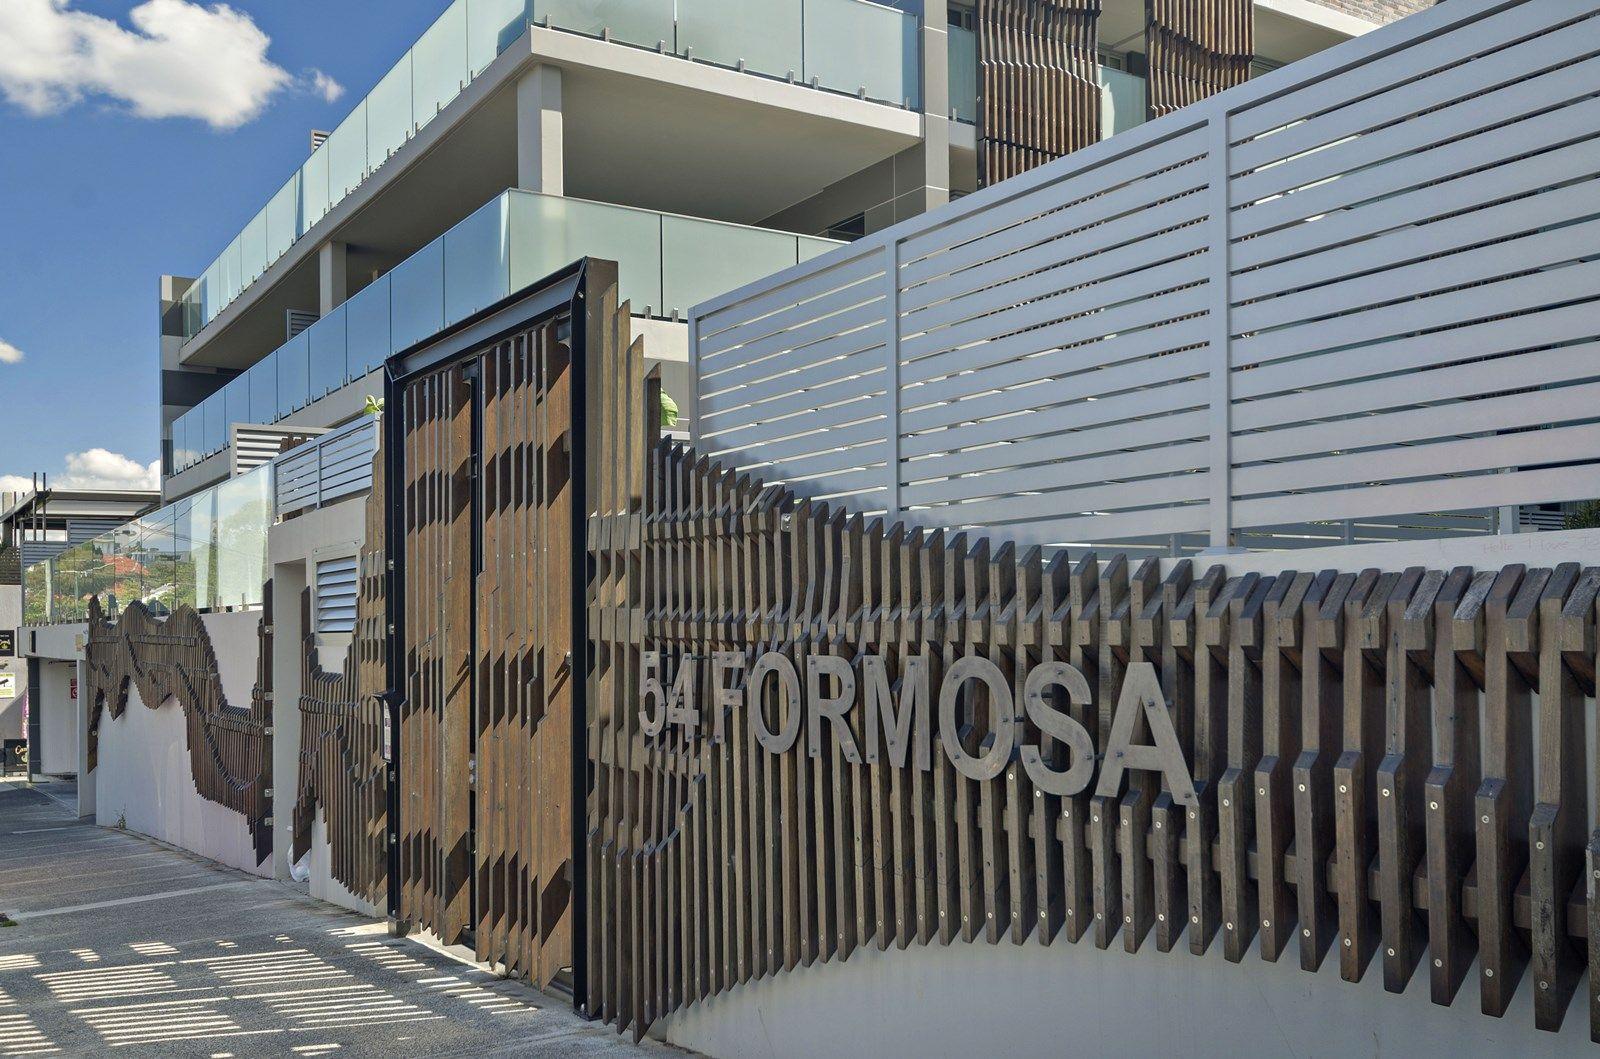 59/54 Formosa Street, Drummoyne NSW 2047, Image 2